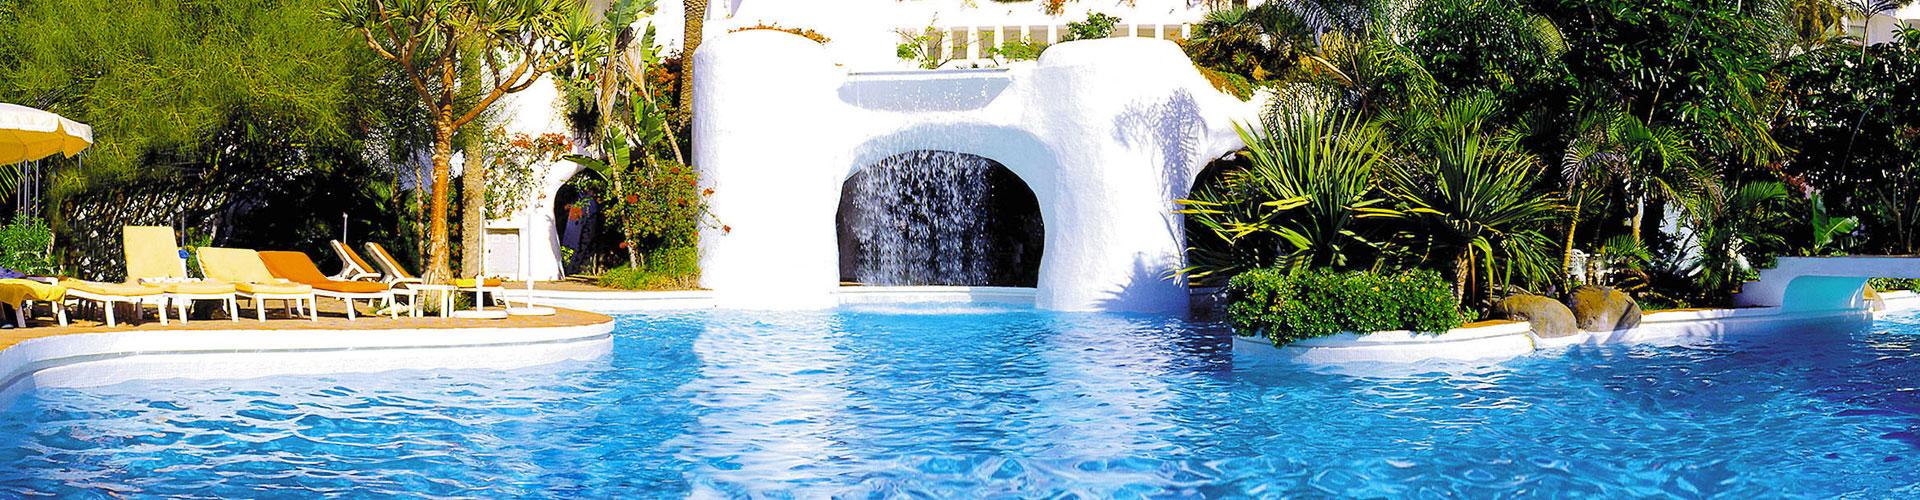 MasterTours   Mastertours Golfreisen - Hotel Jardín Tropical Spanien ...